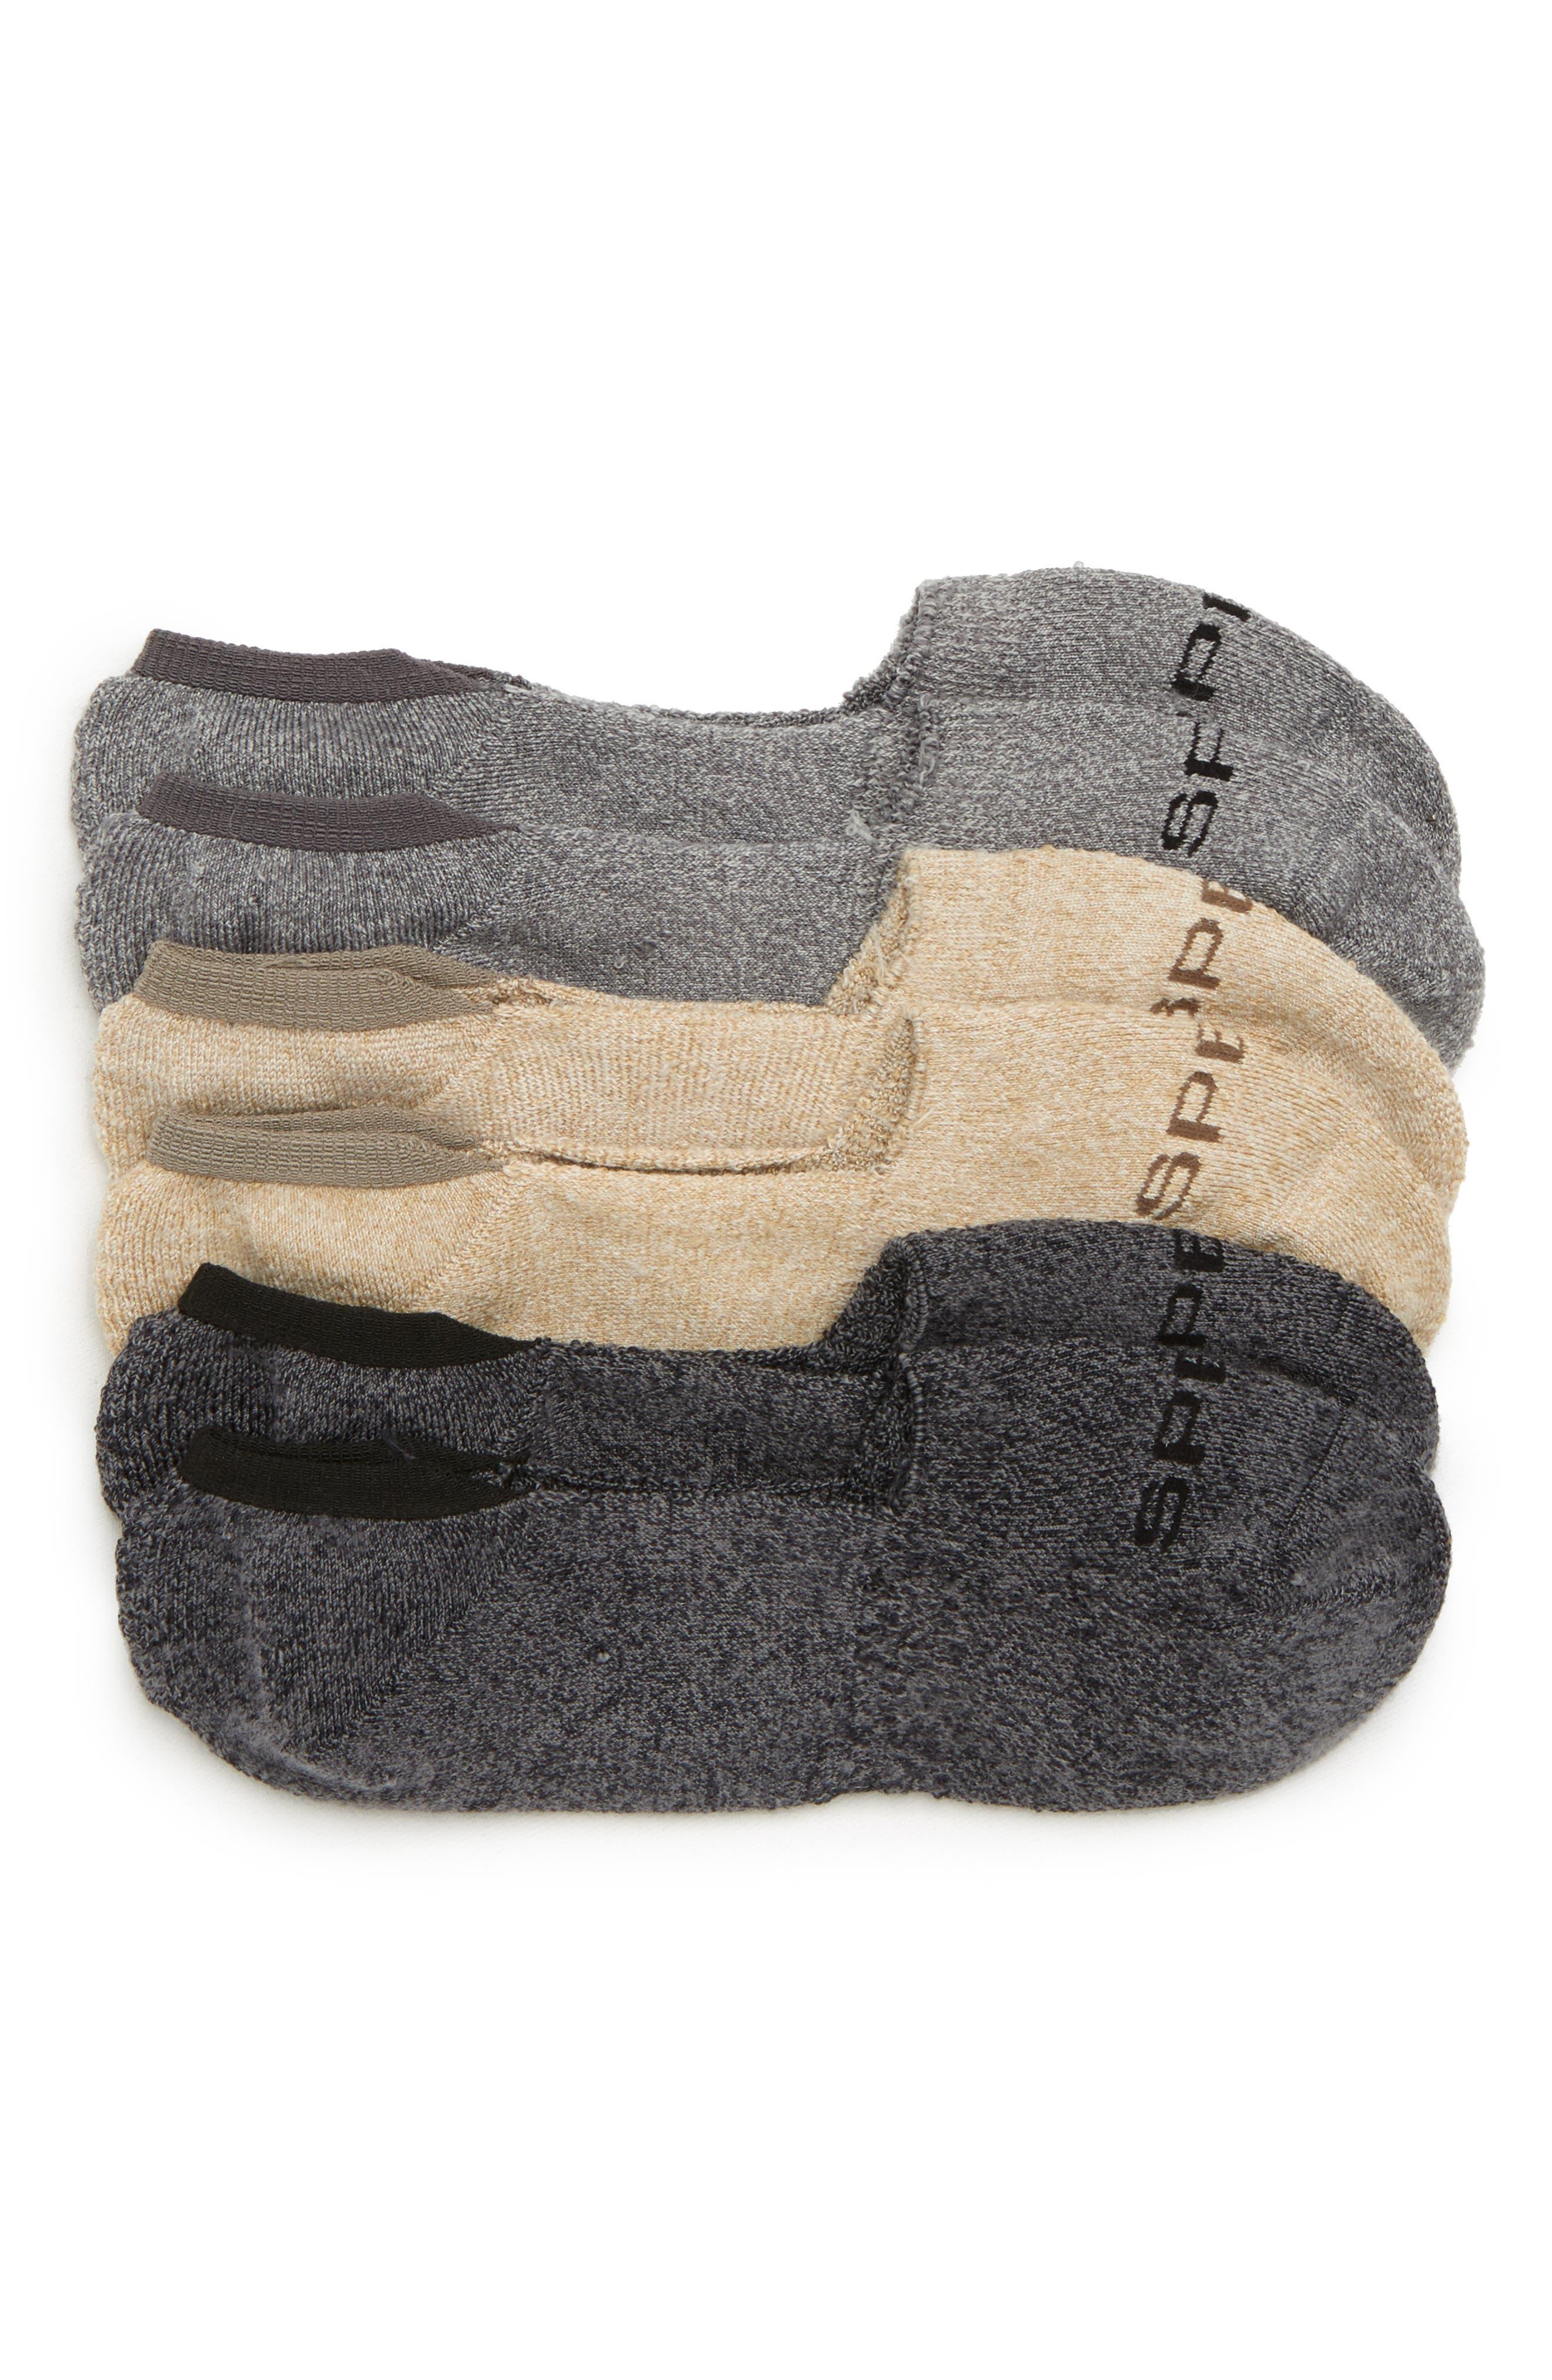 Top-Sider 3-Pack Microfiber Liner Socks,                         Main,                         color, Grey Marl